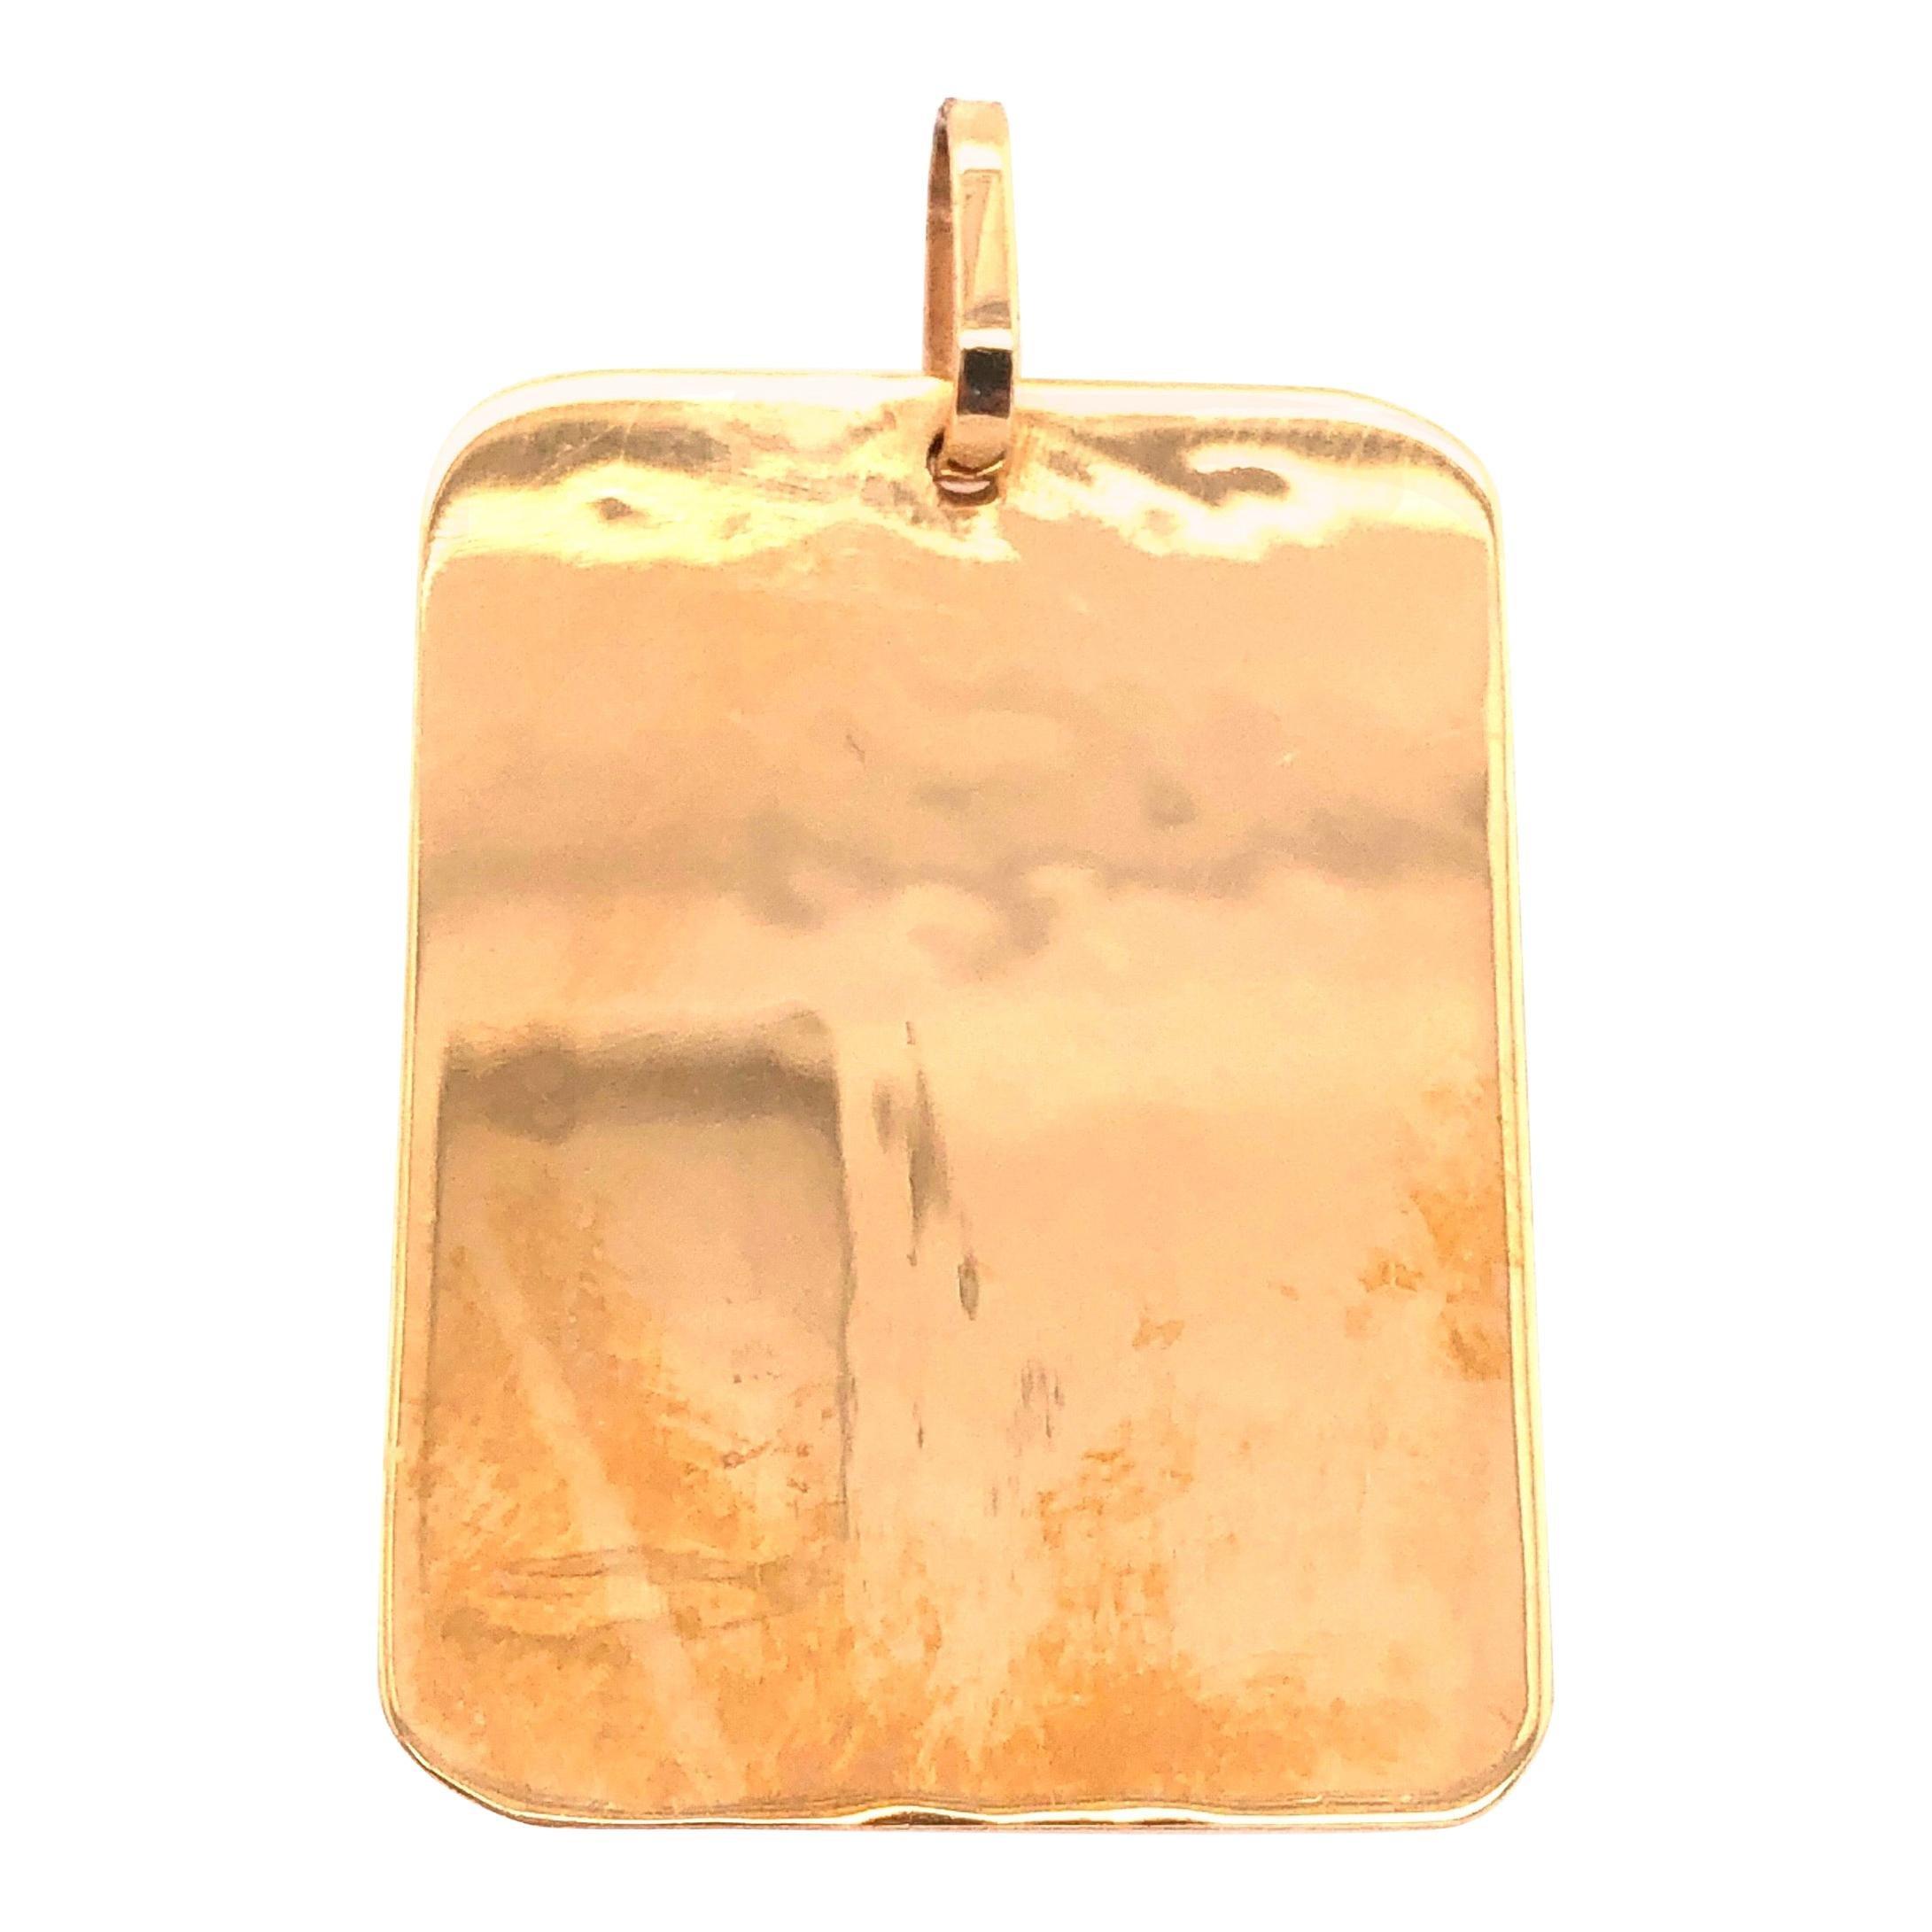 14 Karat Yellow Gold Tag / Charm Pendant